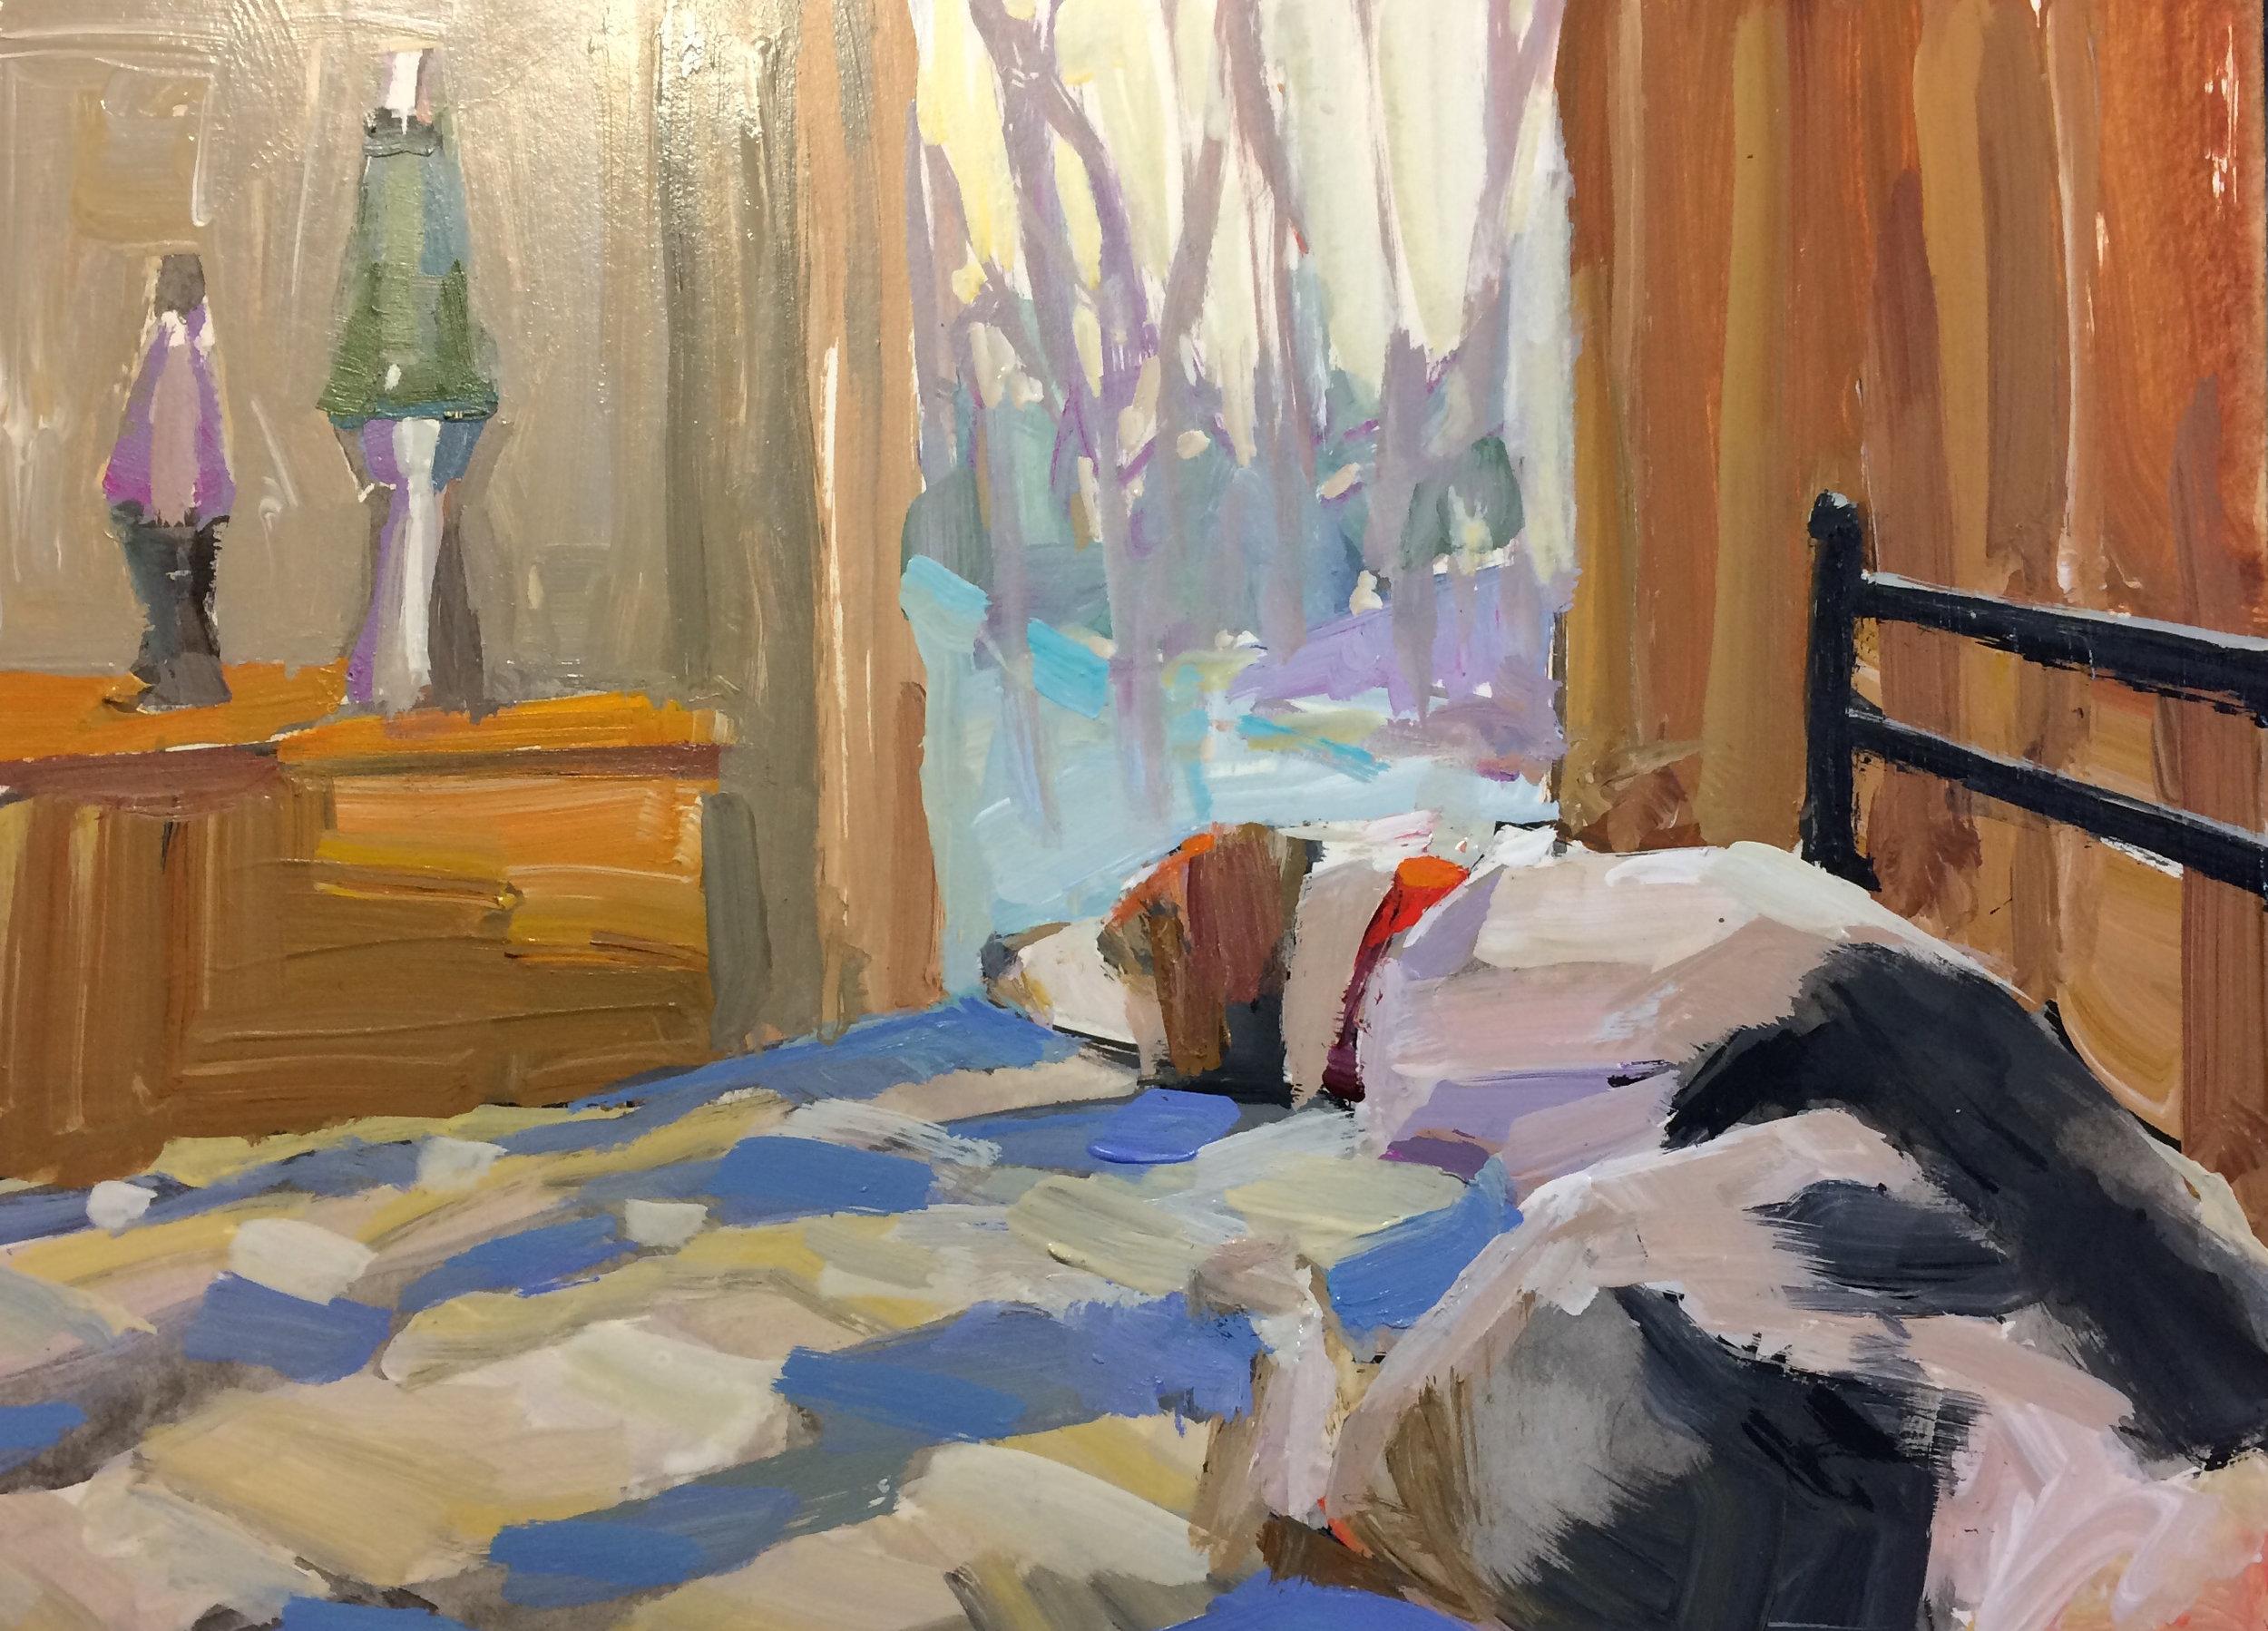 hound dog on the bed.jpg